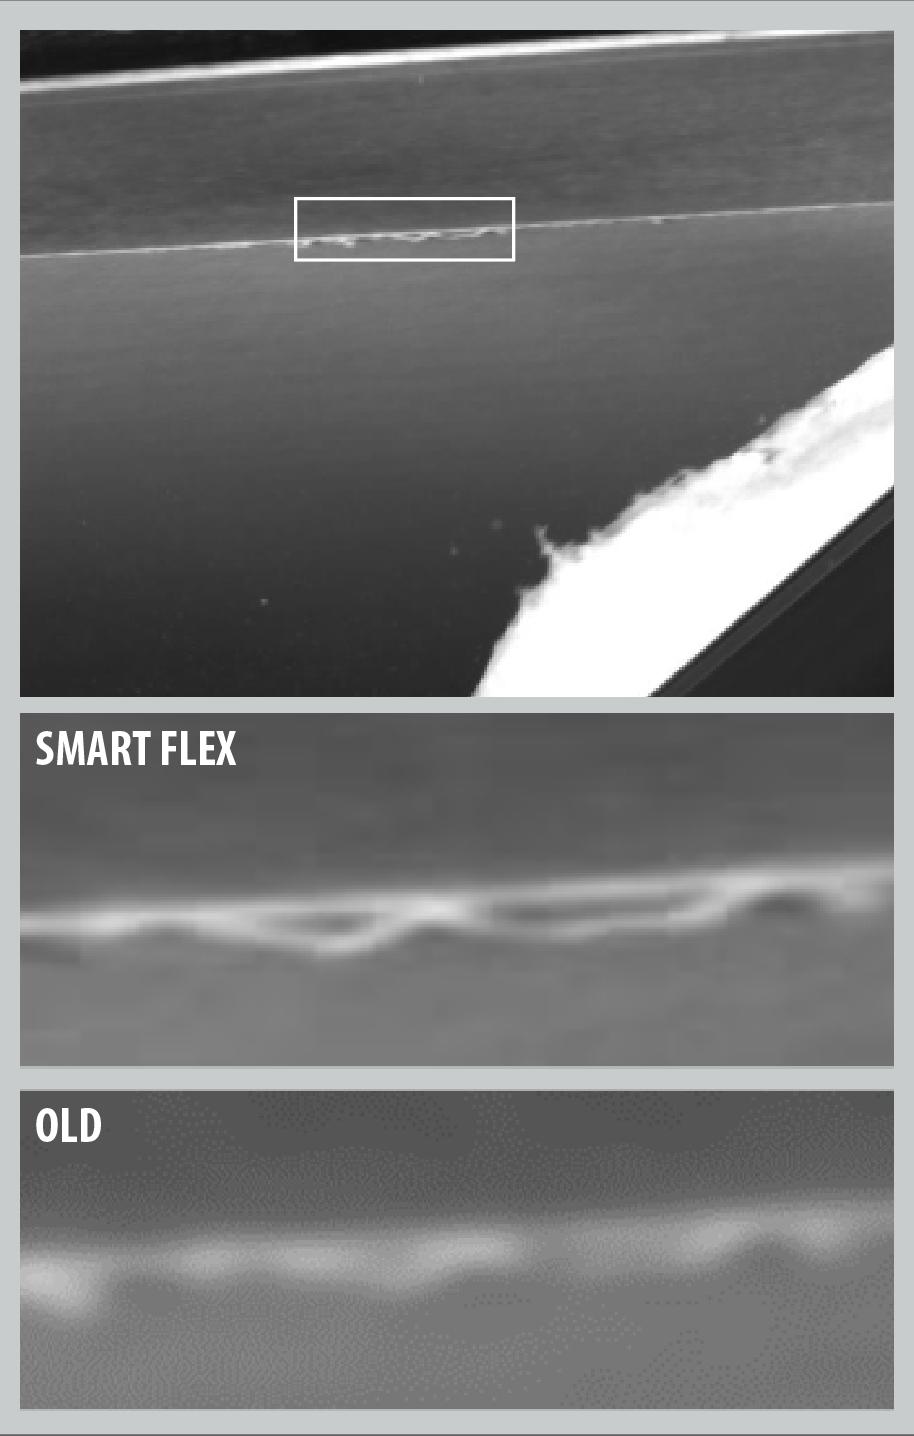 smartflex-oldvnew-vert.png